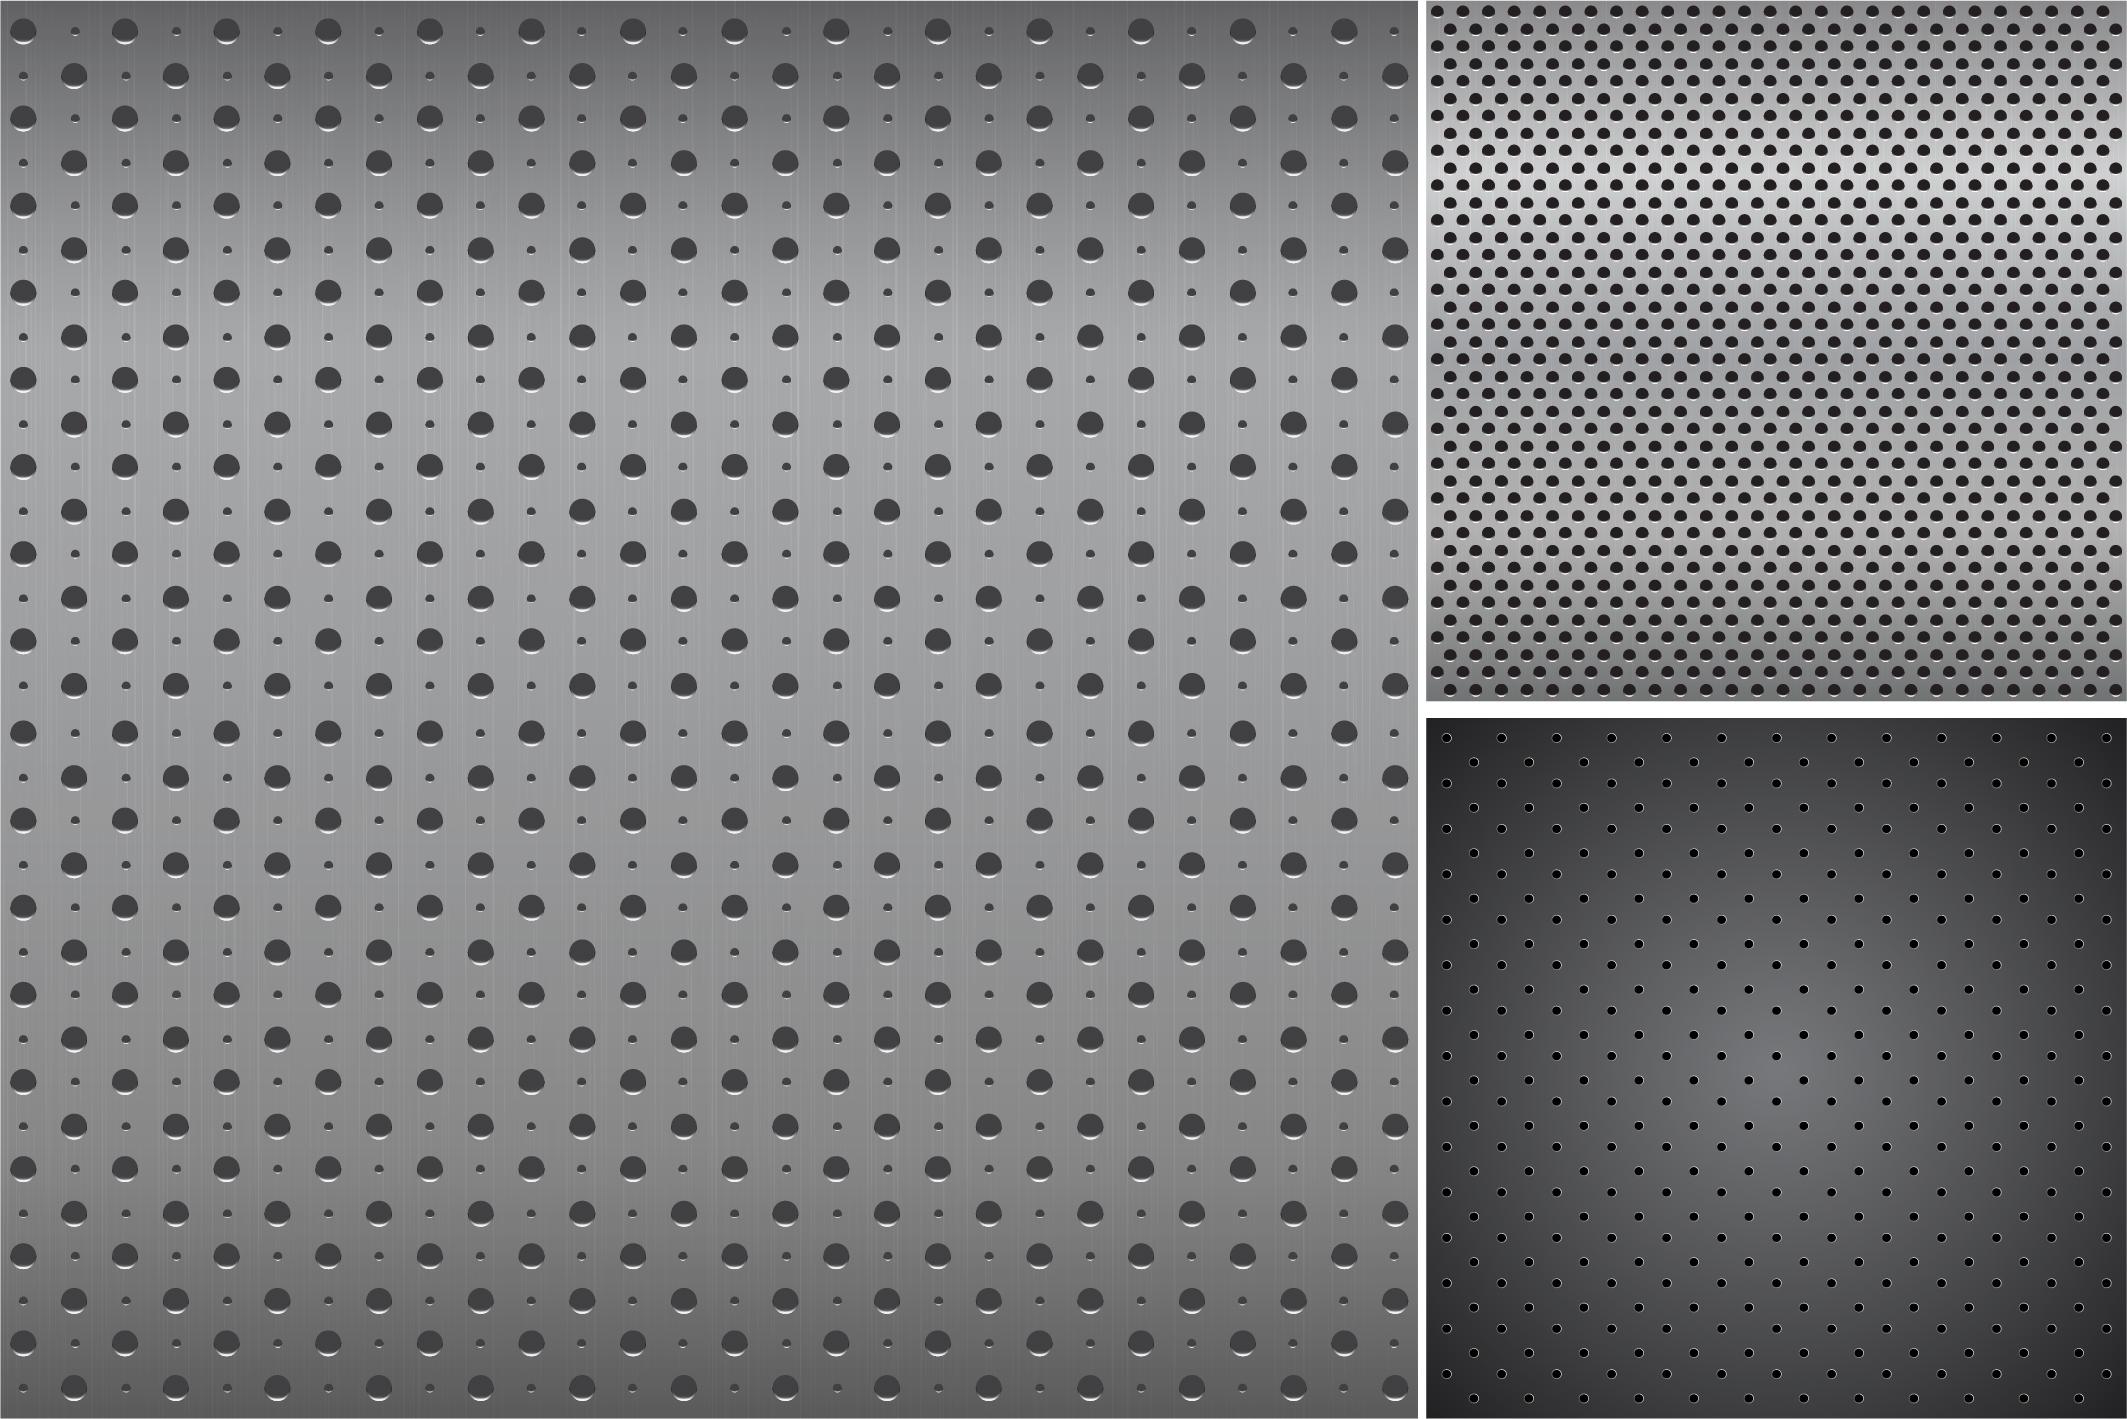 Metallic dark textures with holes. example image 9